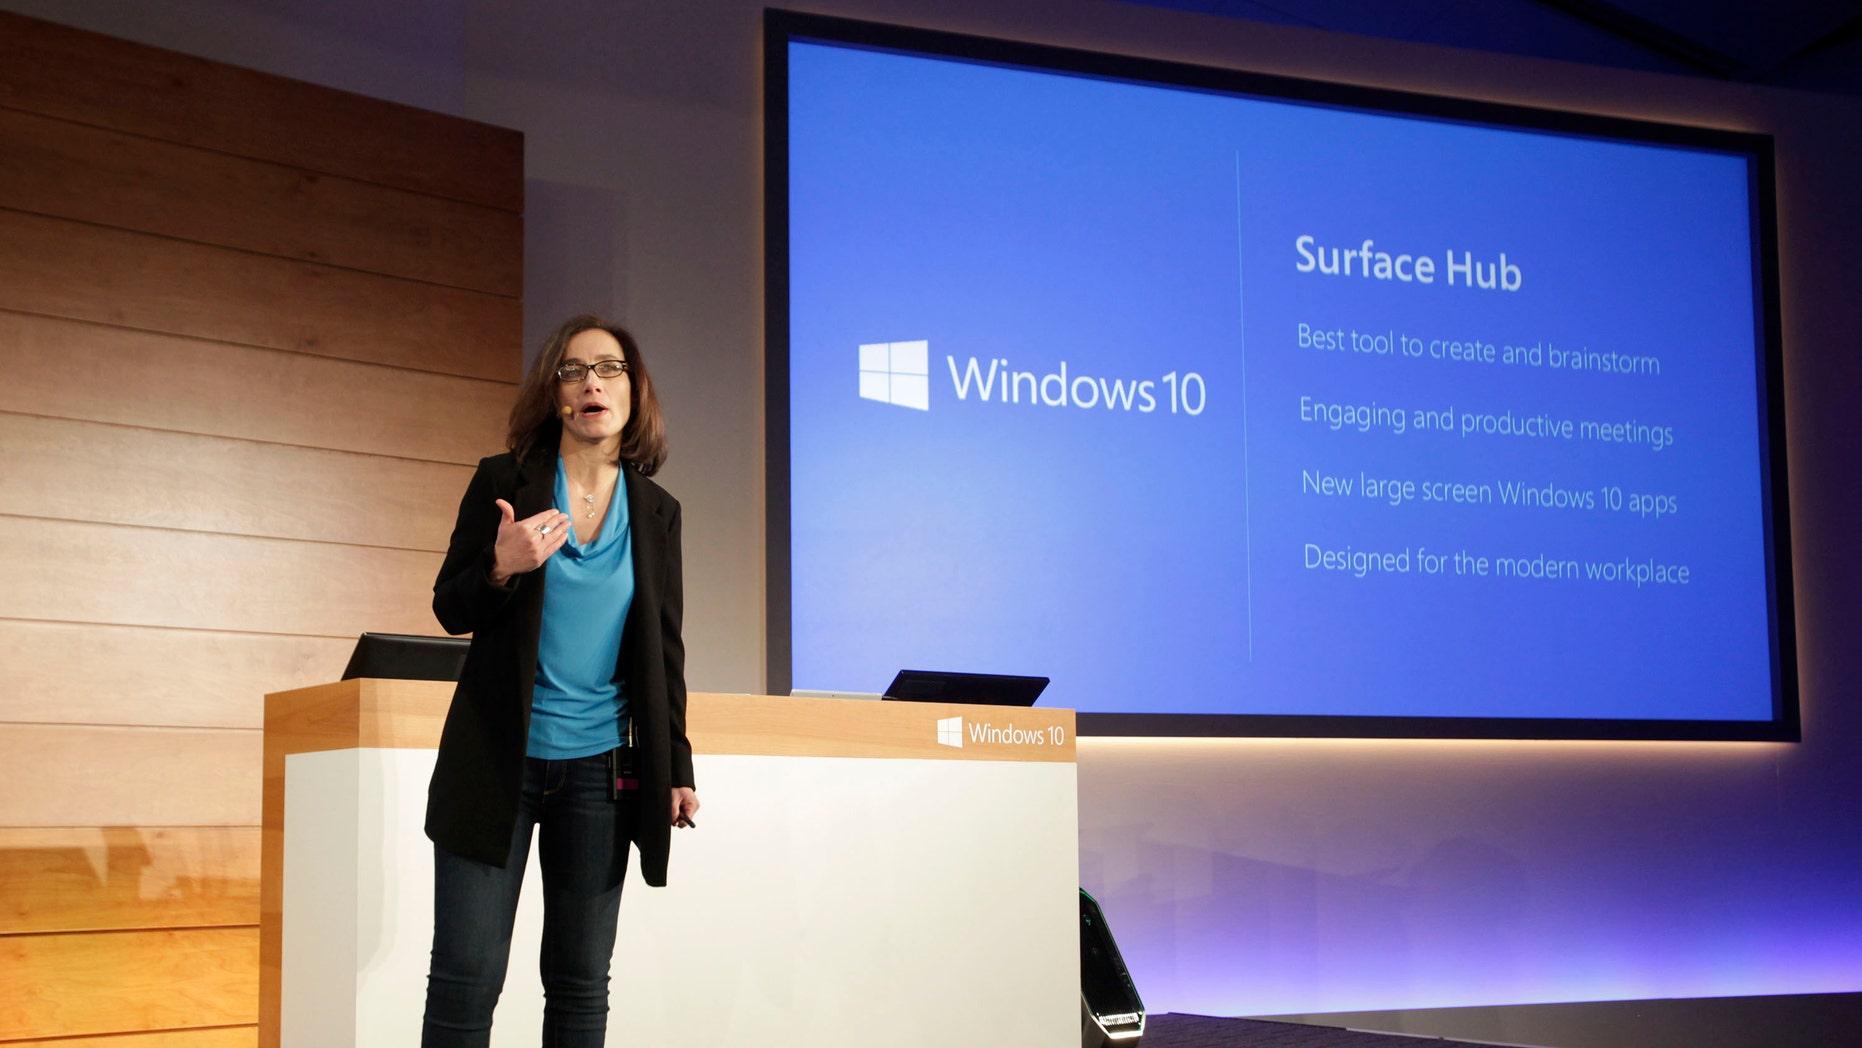 Microsoft Surface Hub looks to transform meetings | Fox News